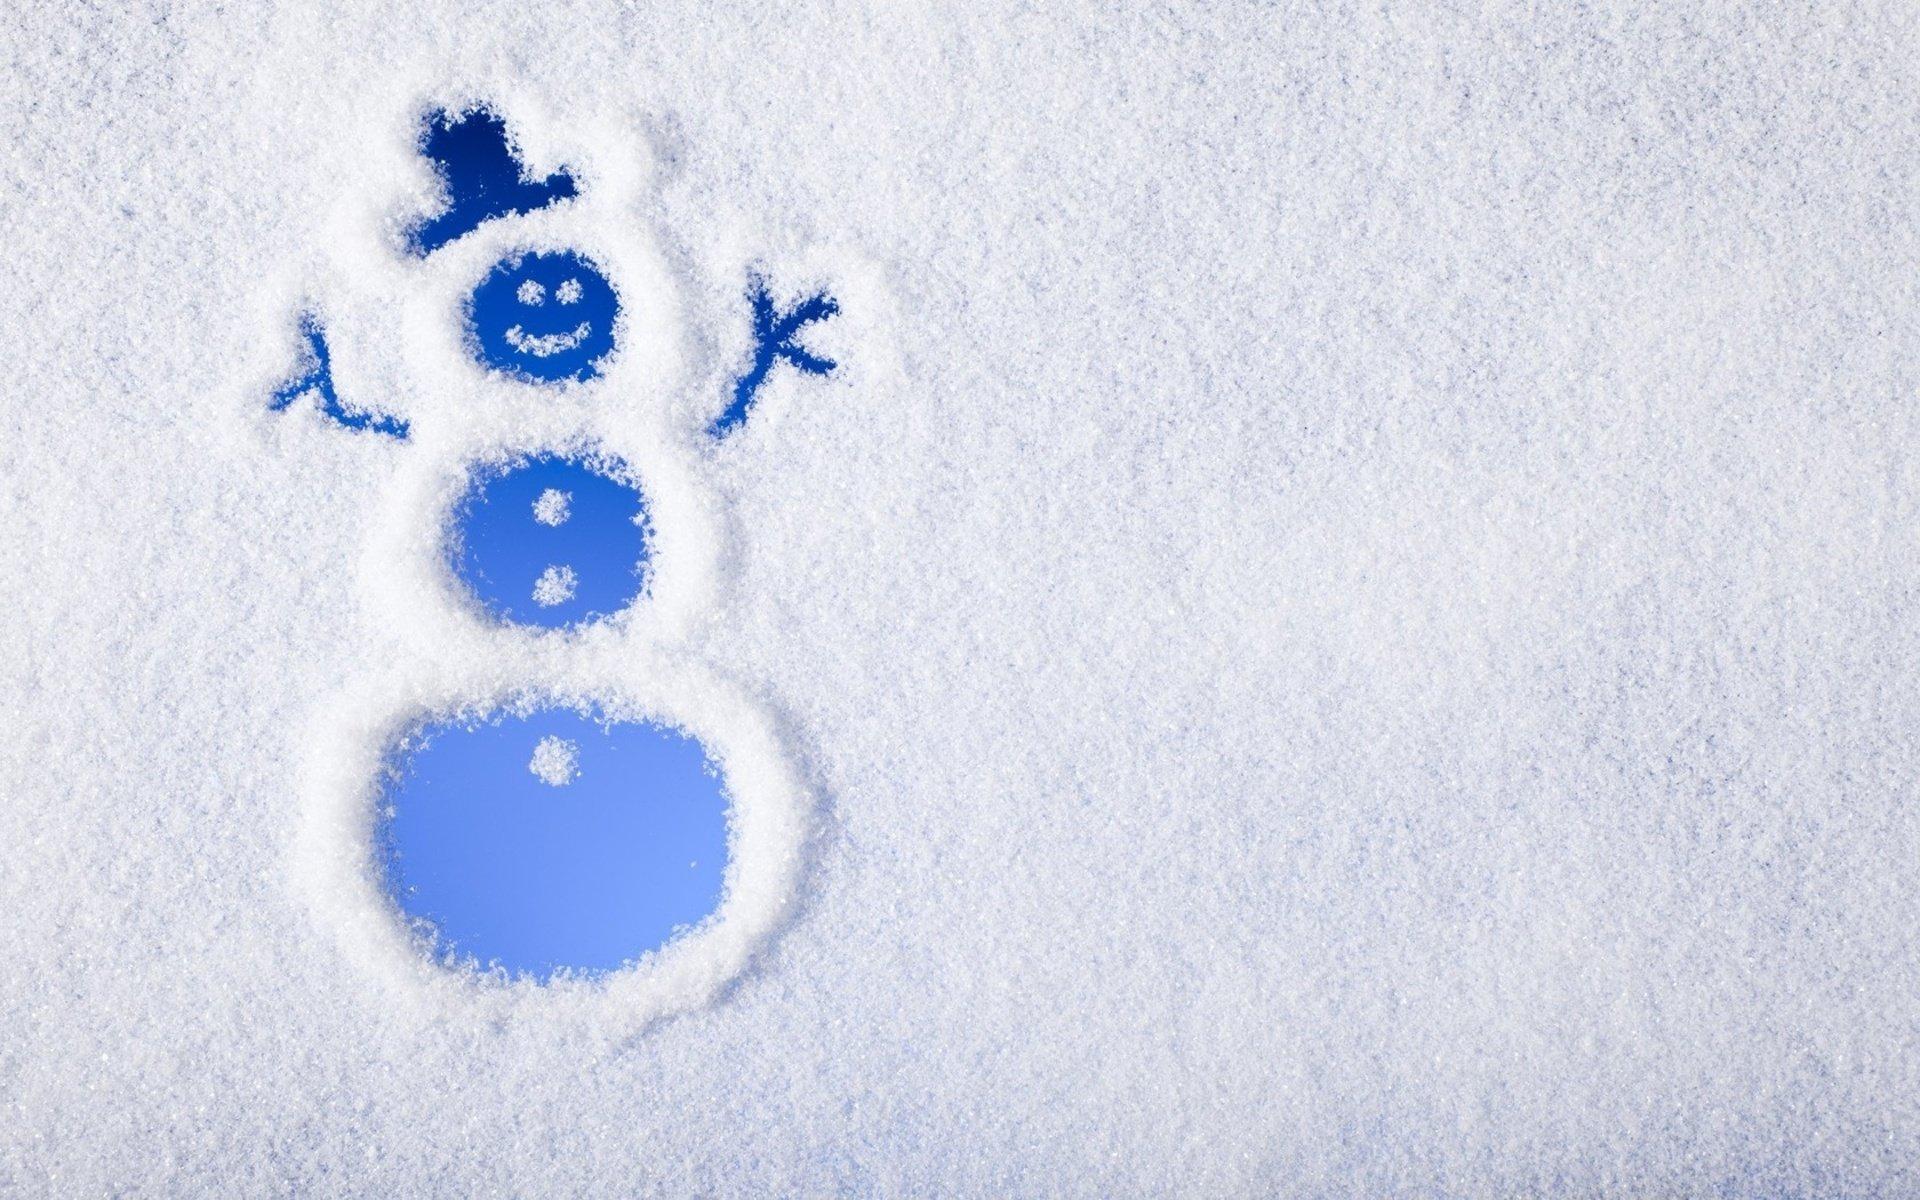 Snowman Hd Wallpaper Background Image 1920x1200 Id 333072